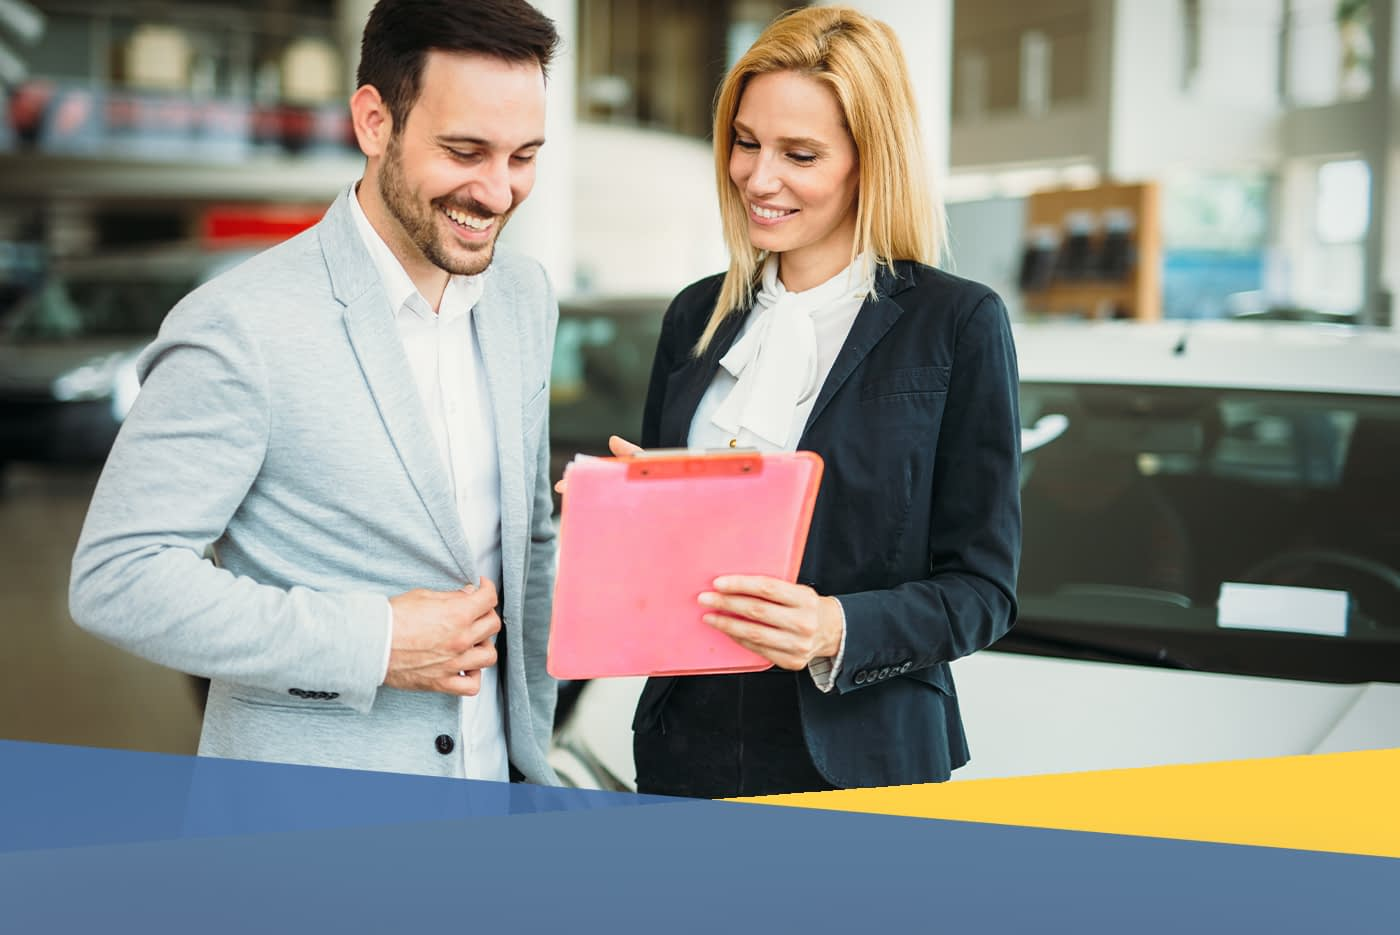 Person purchasing their car at an auto dealer